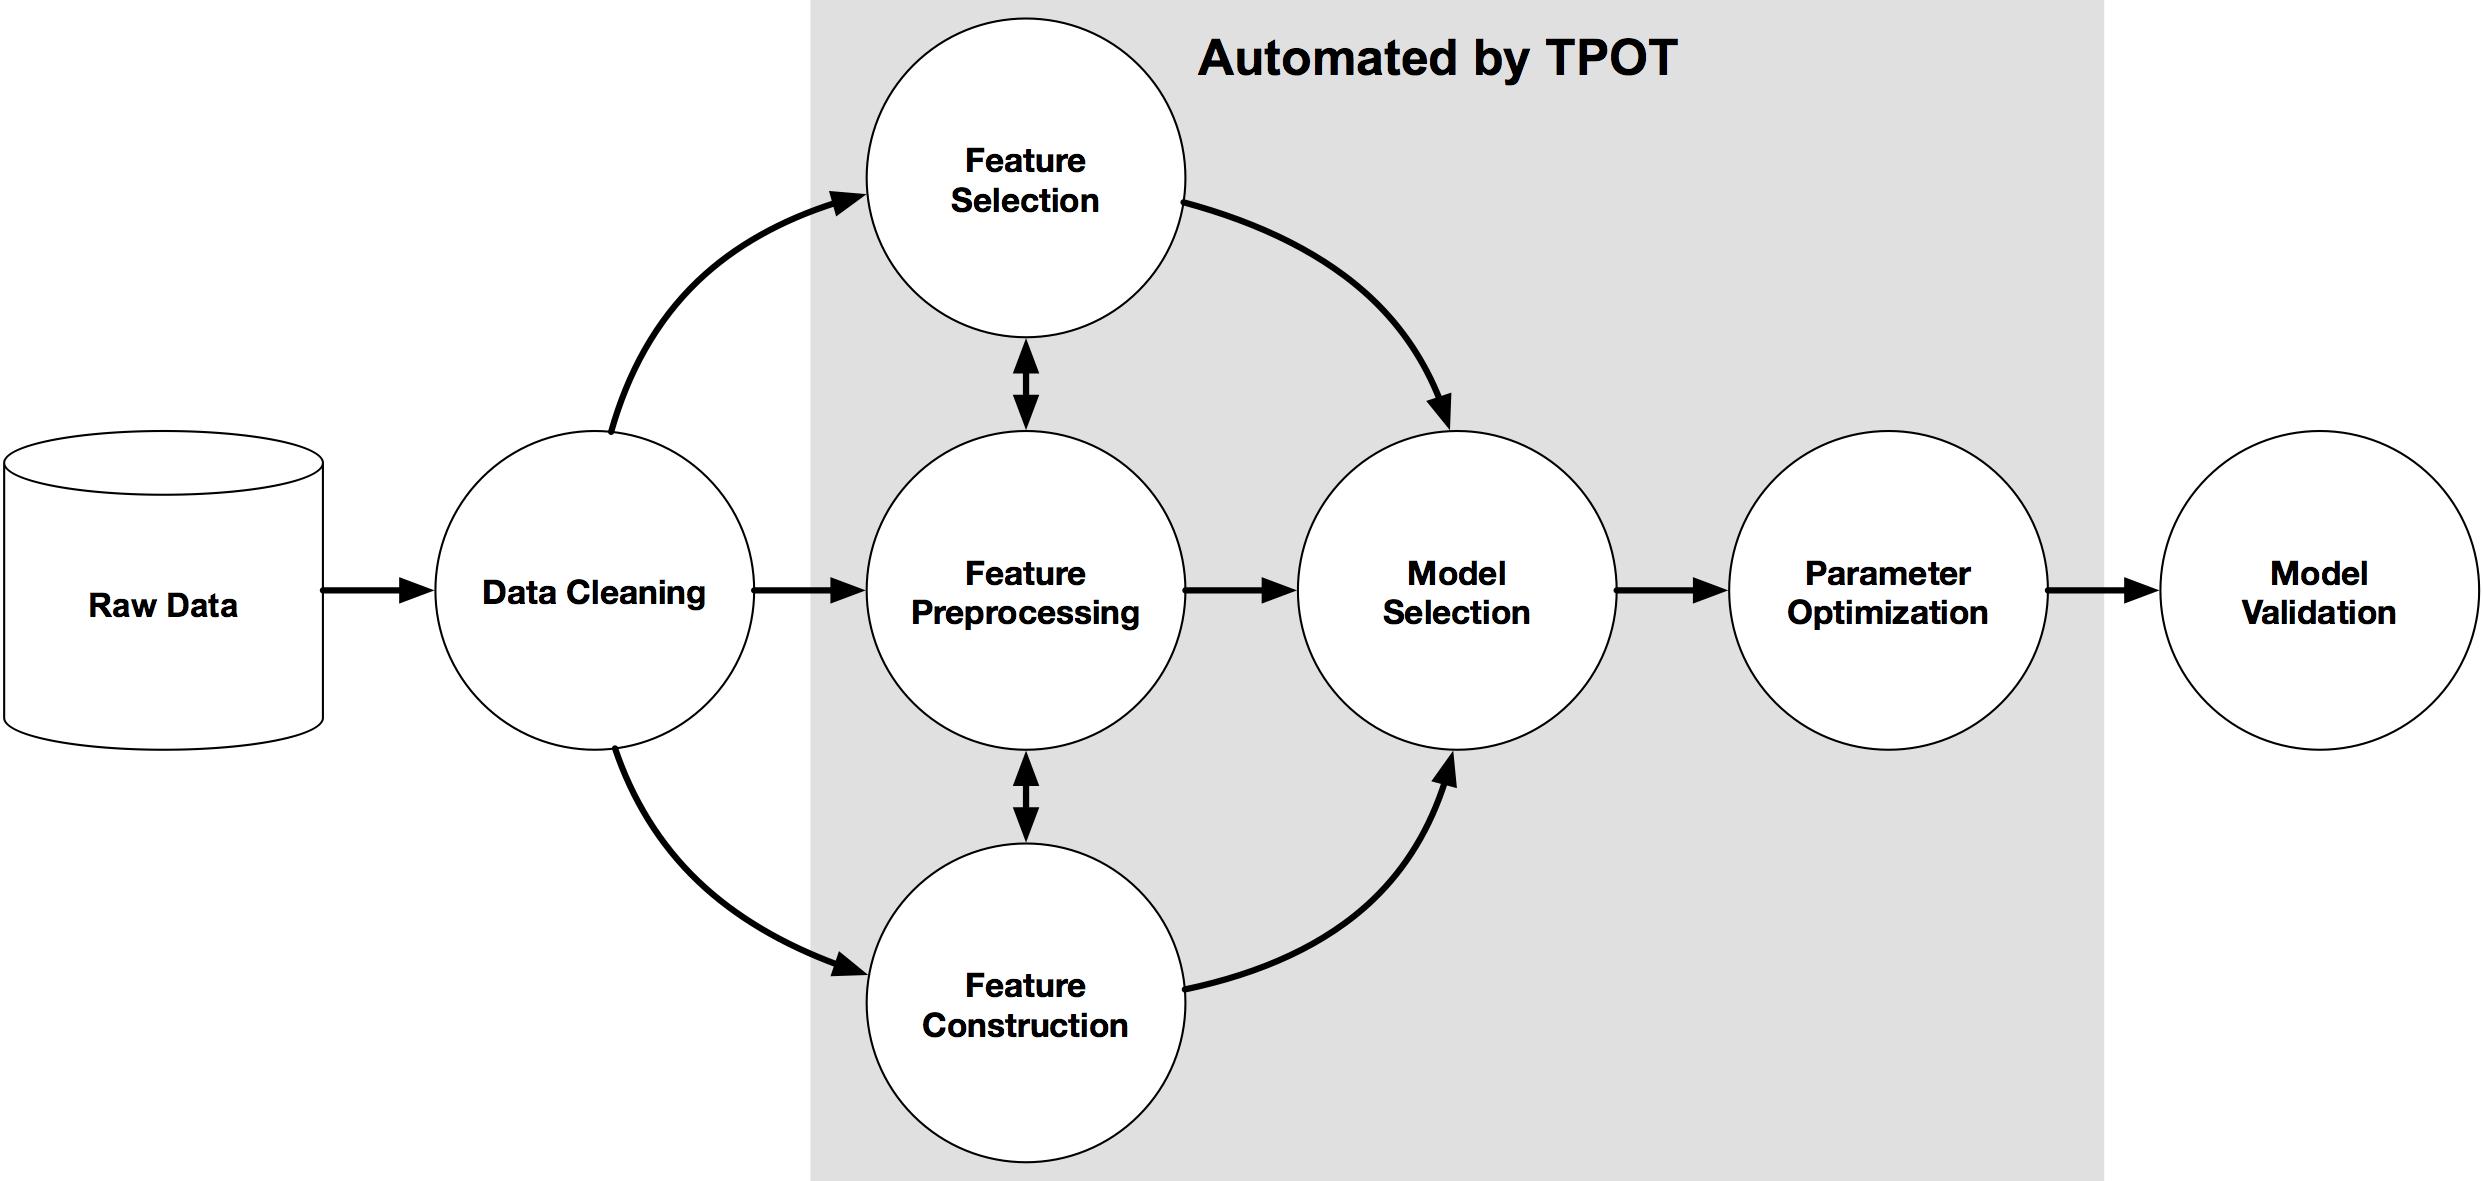 TPOT Machine Learning Pipeline